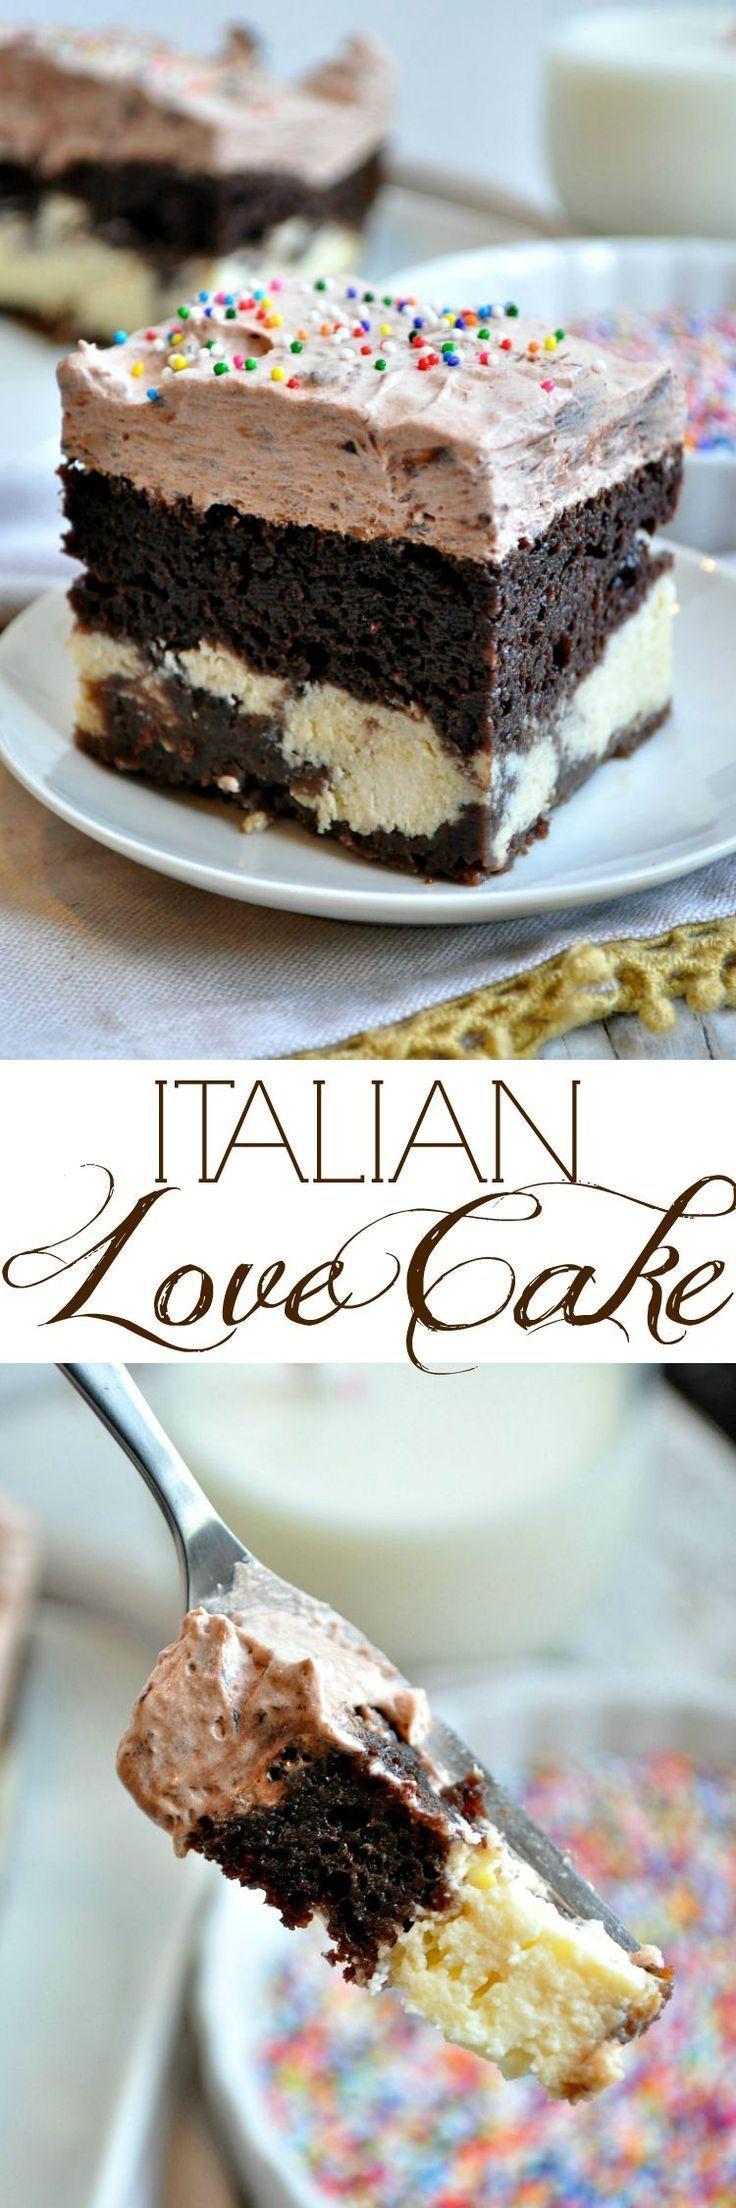 Easy romantic chocolate dessert recipes